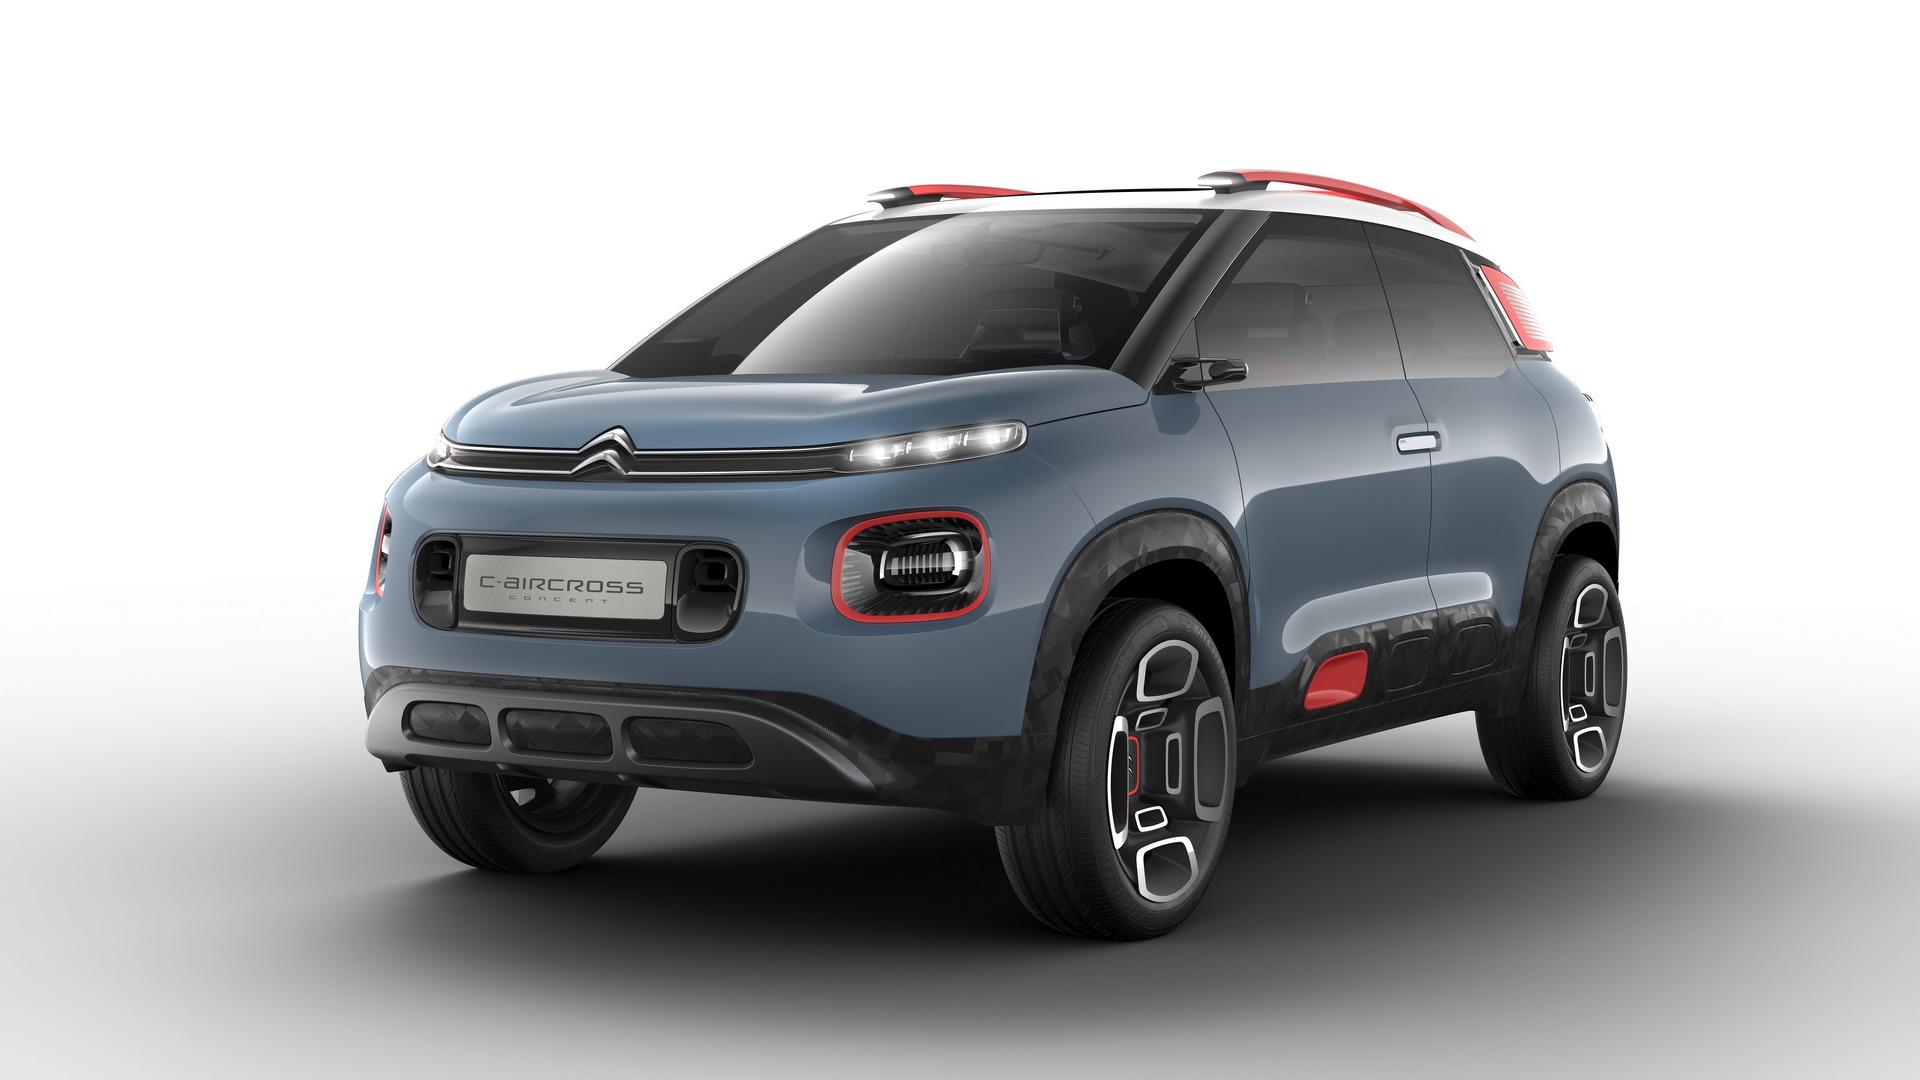 2017-citroen-c-aircross-concept (2)